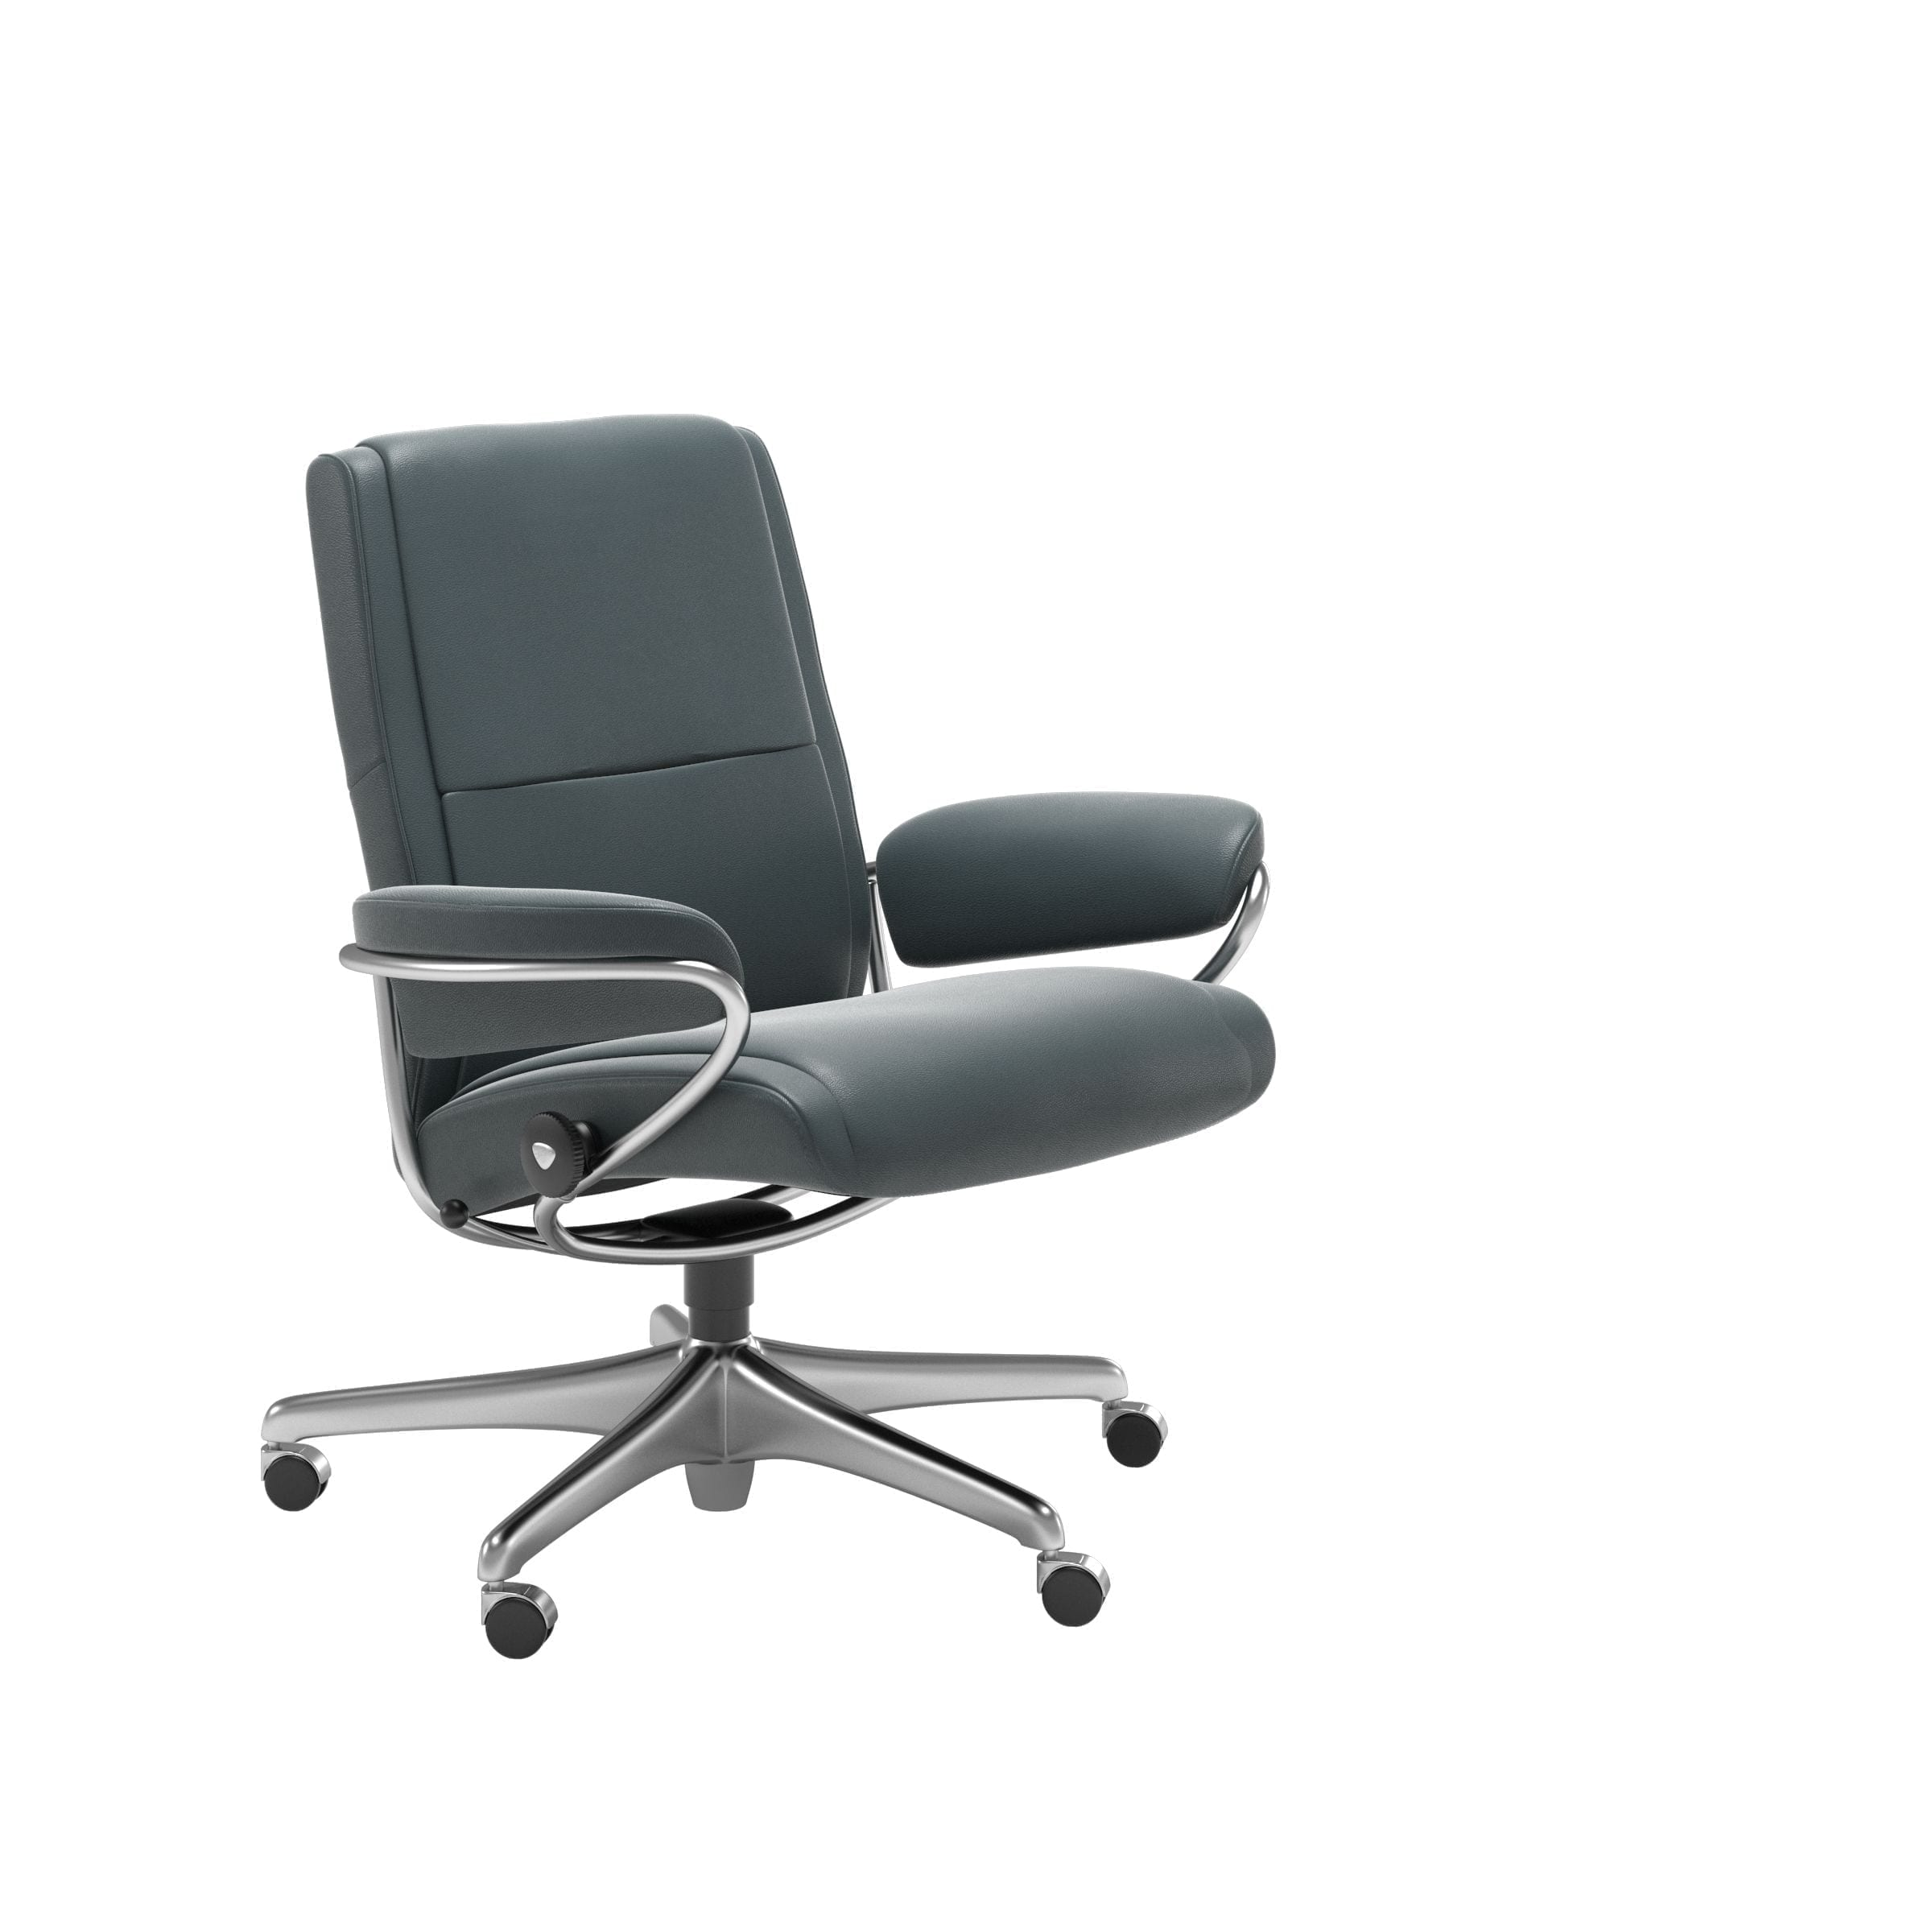 Office Chair Low Back Paris Stressless